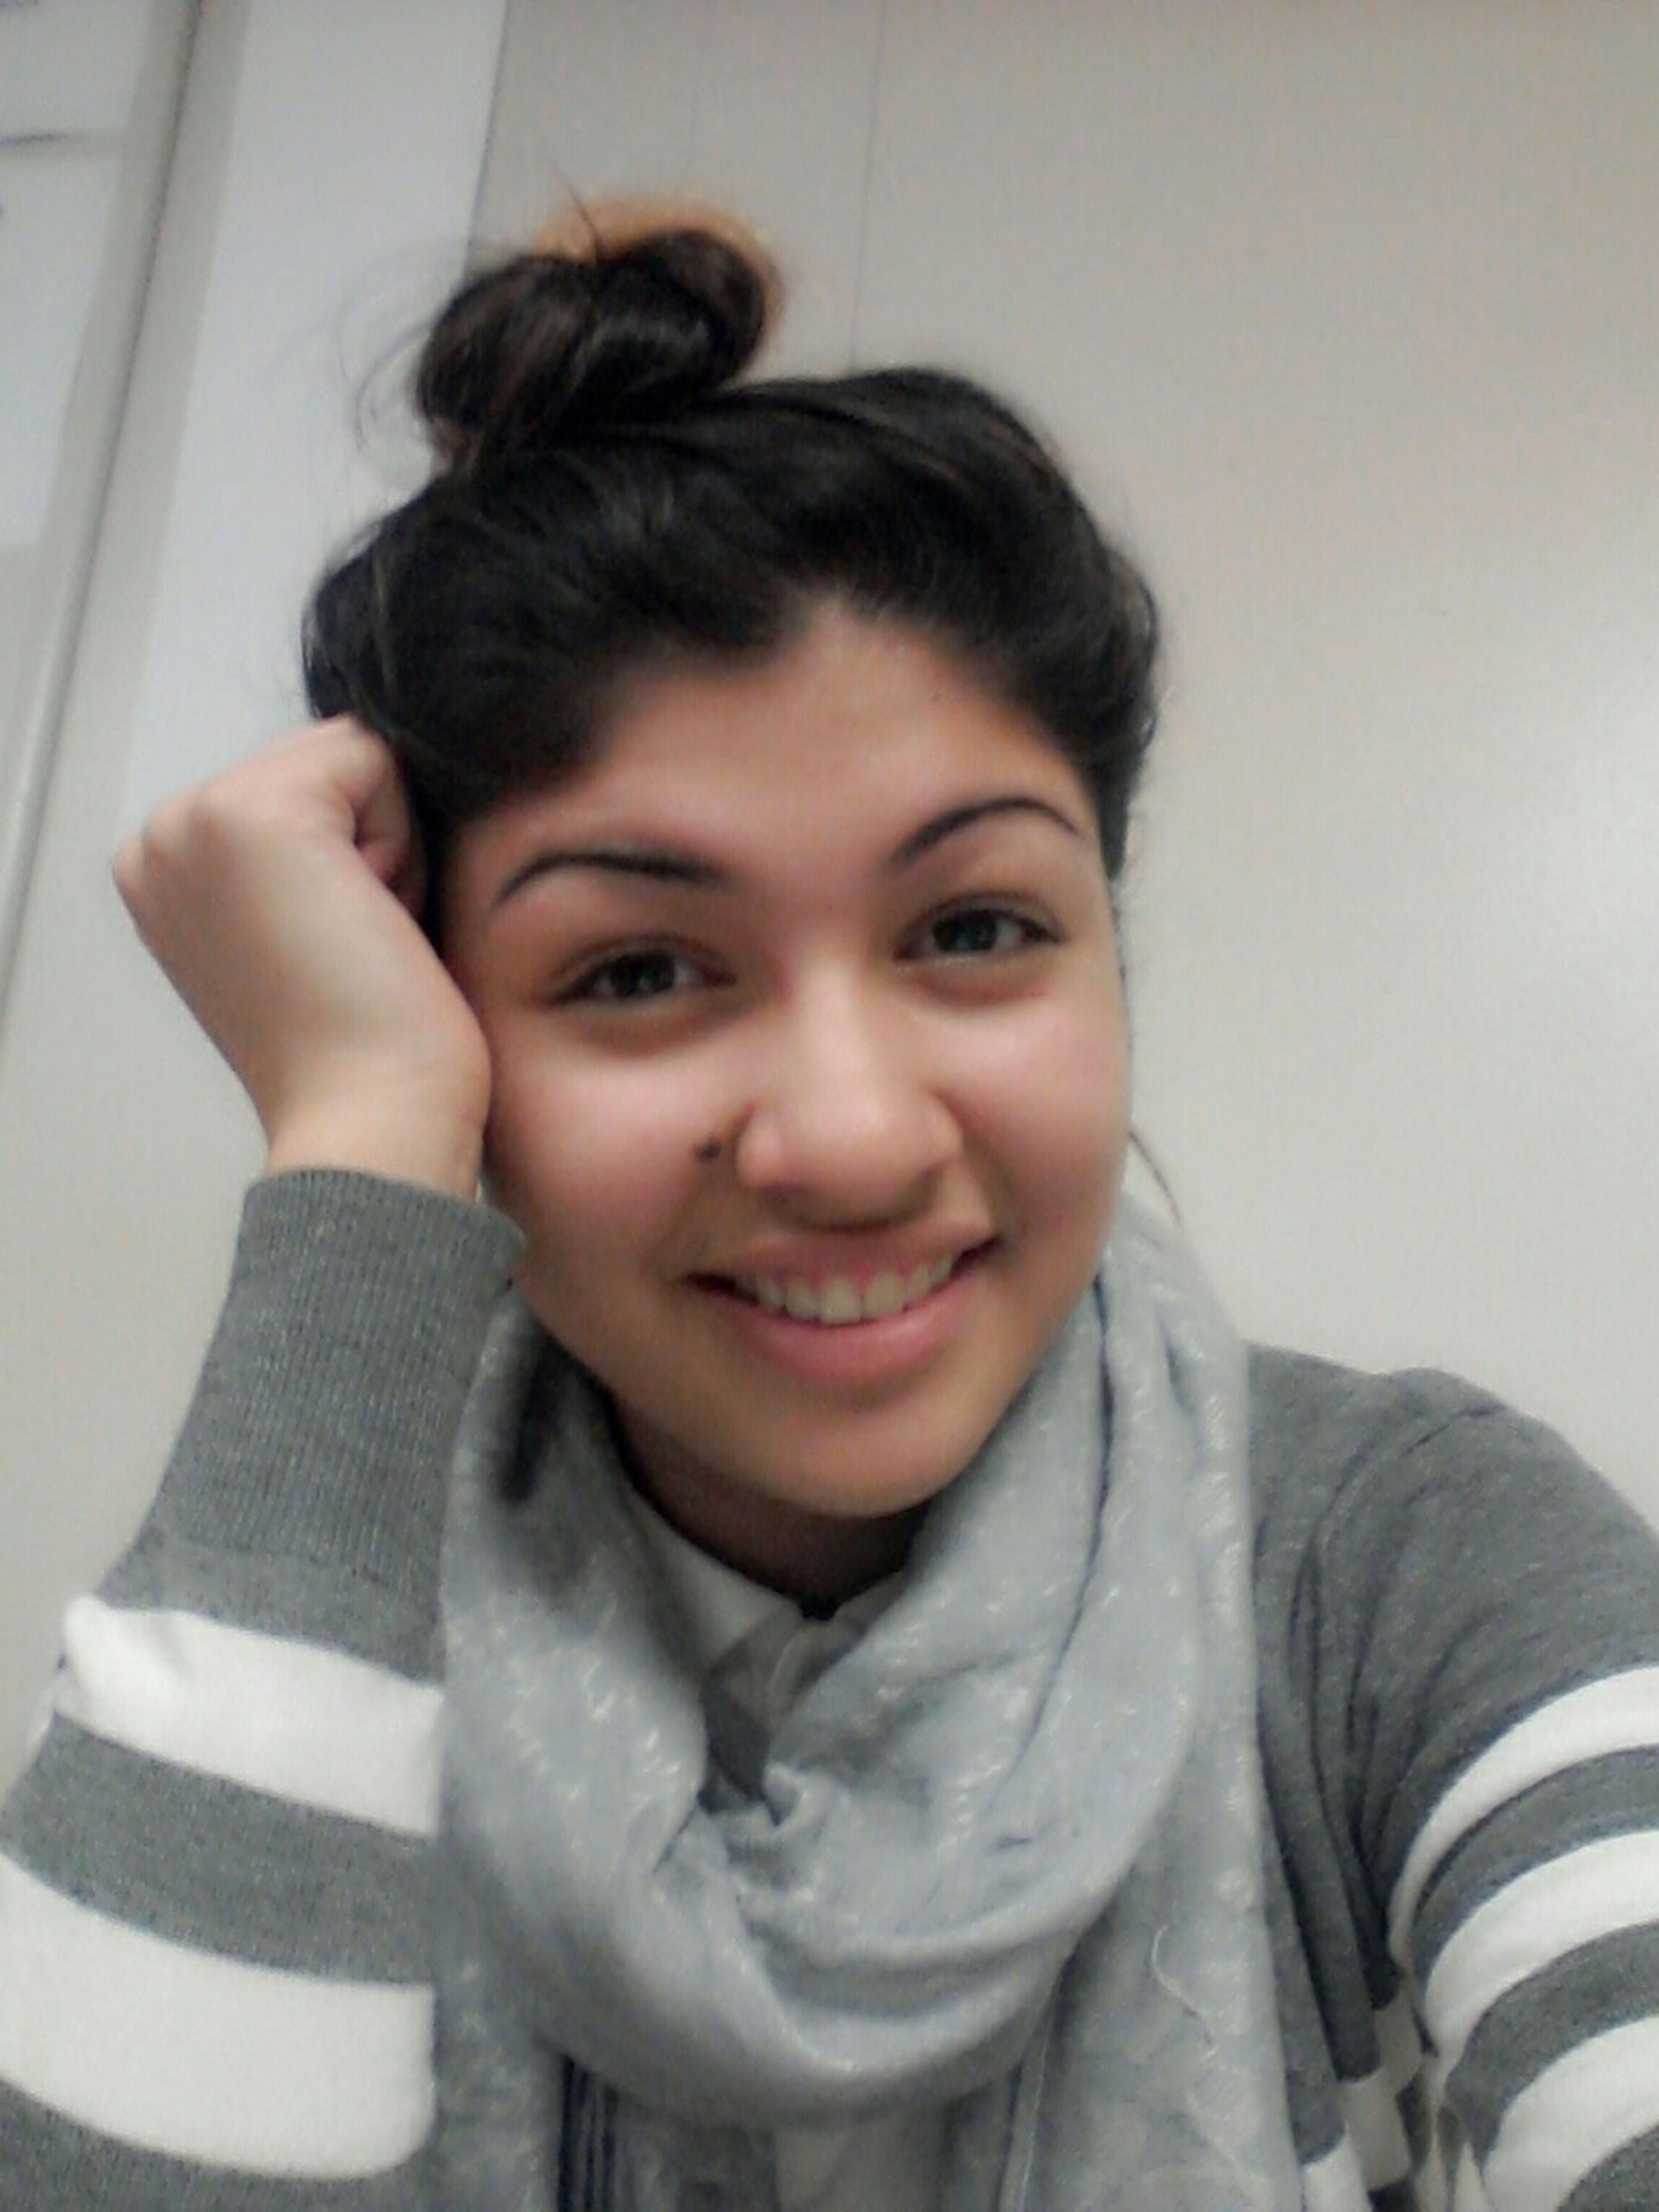 Dont I Look Cute? Lol